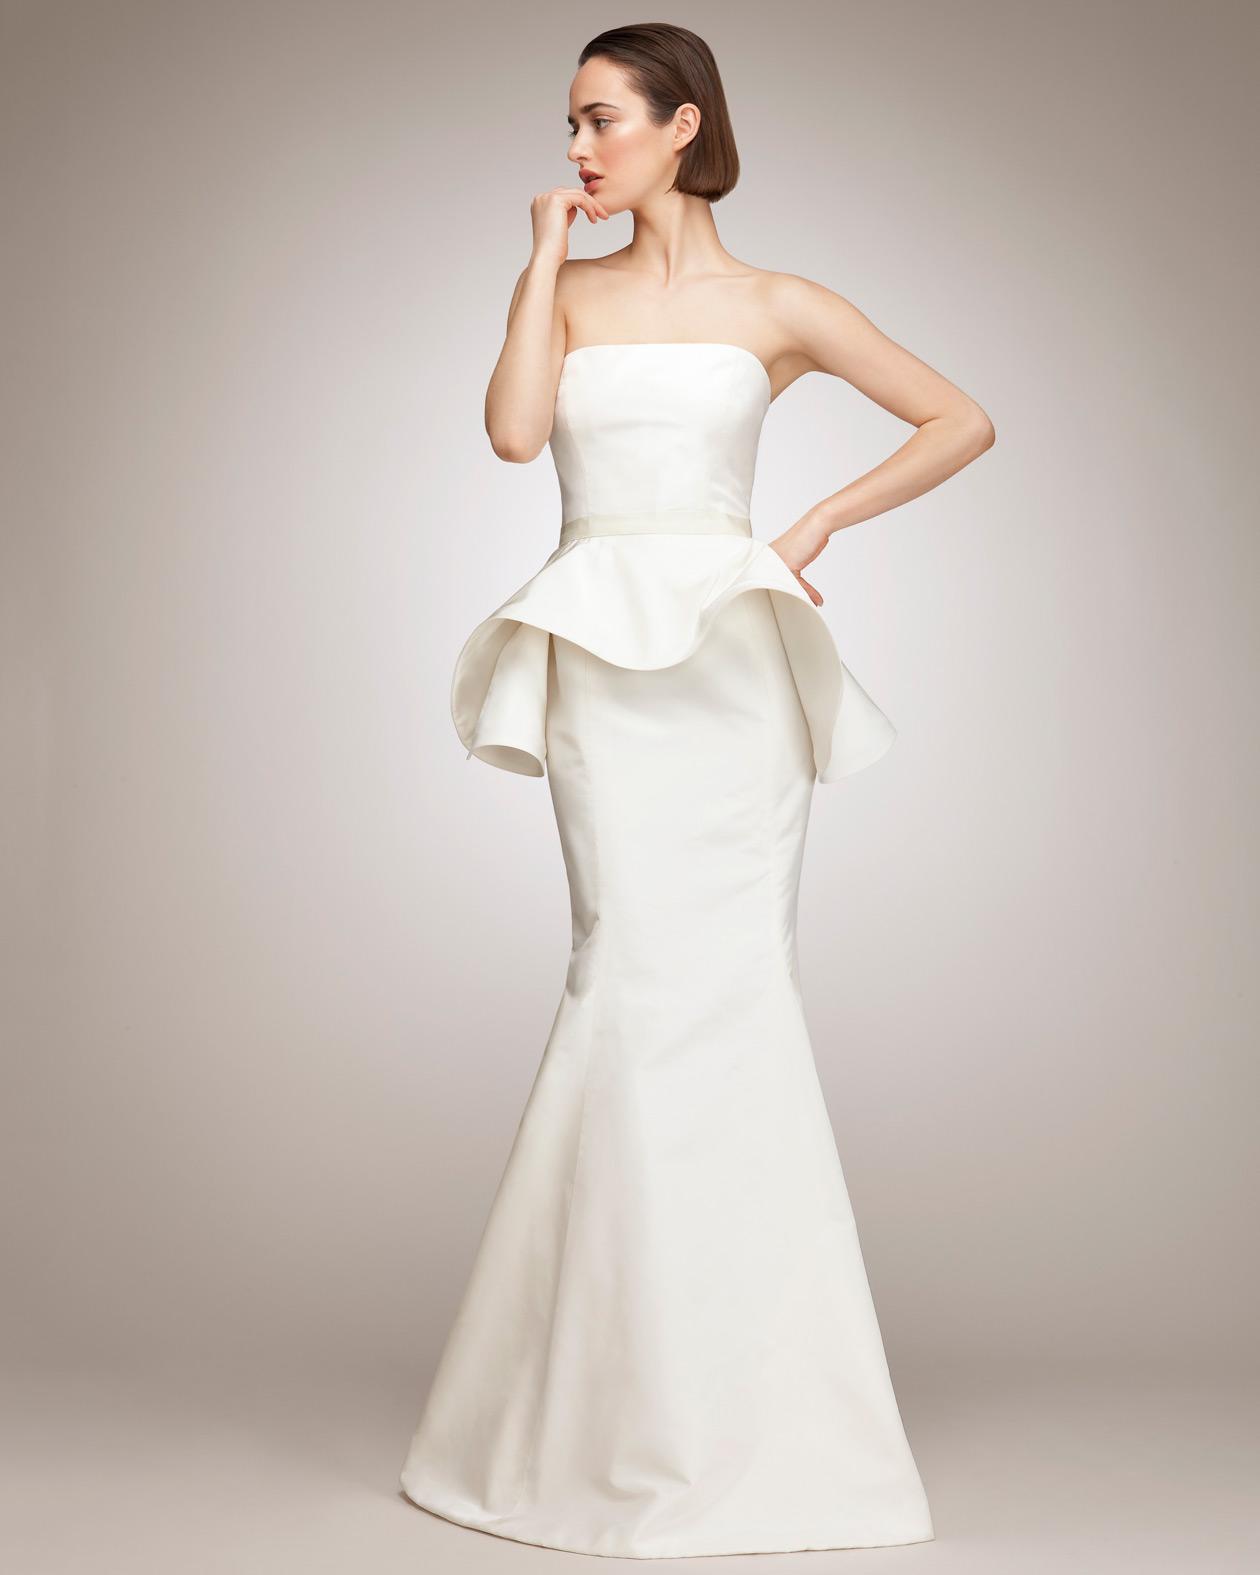 issac-mizrahi-gowns-0611wd4.jpg